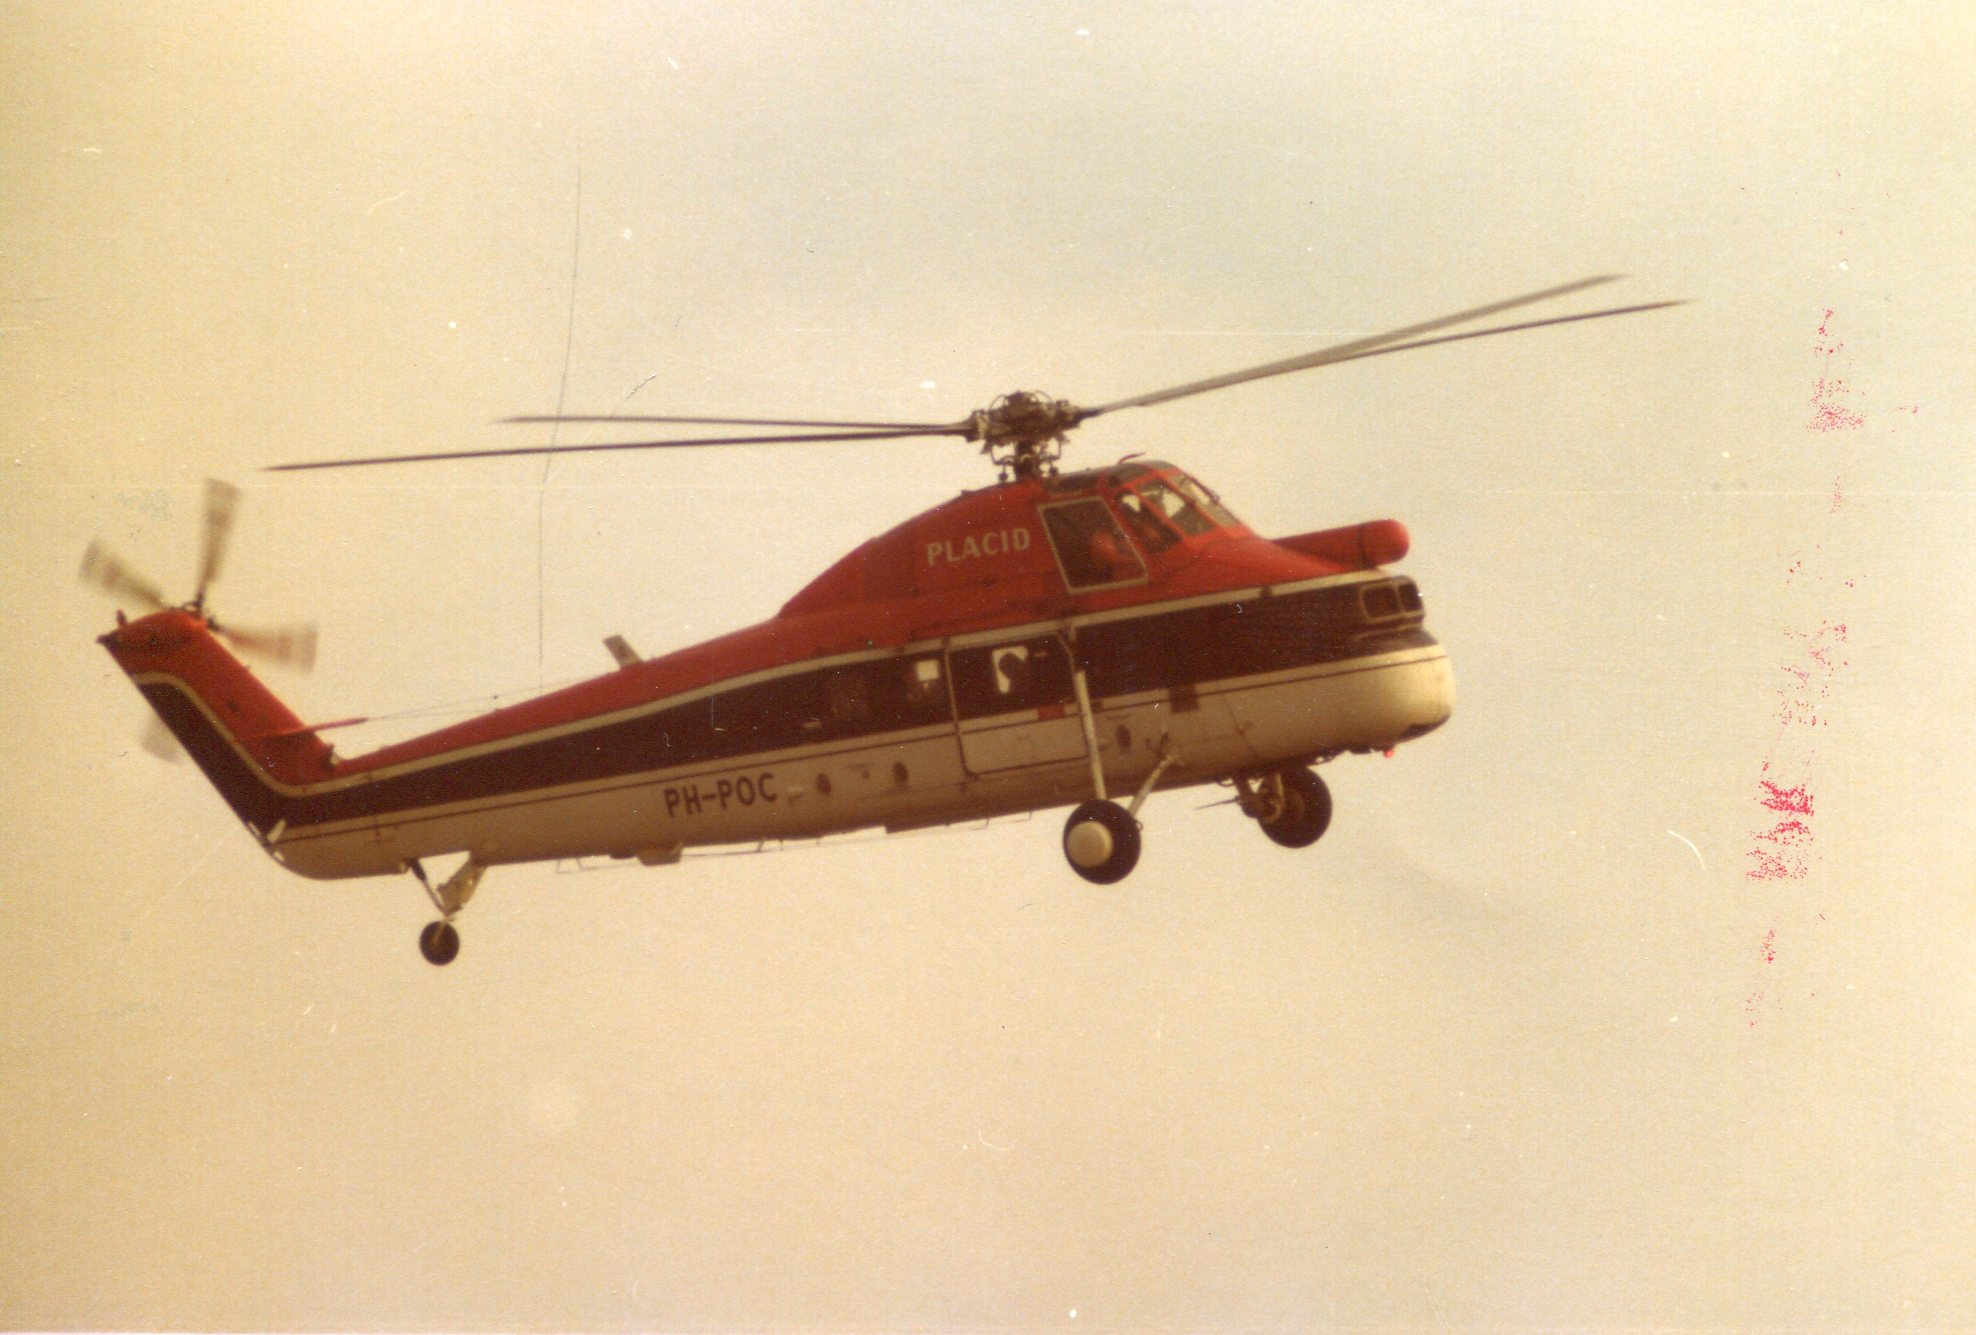 Naam: Den Helder , april 1977 (3).jpg Bekeken: 232 Grootte: 334,4 KB